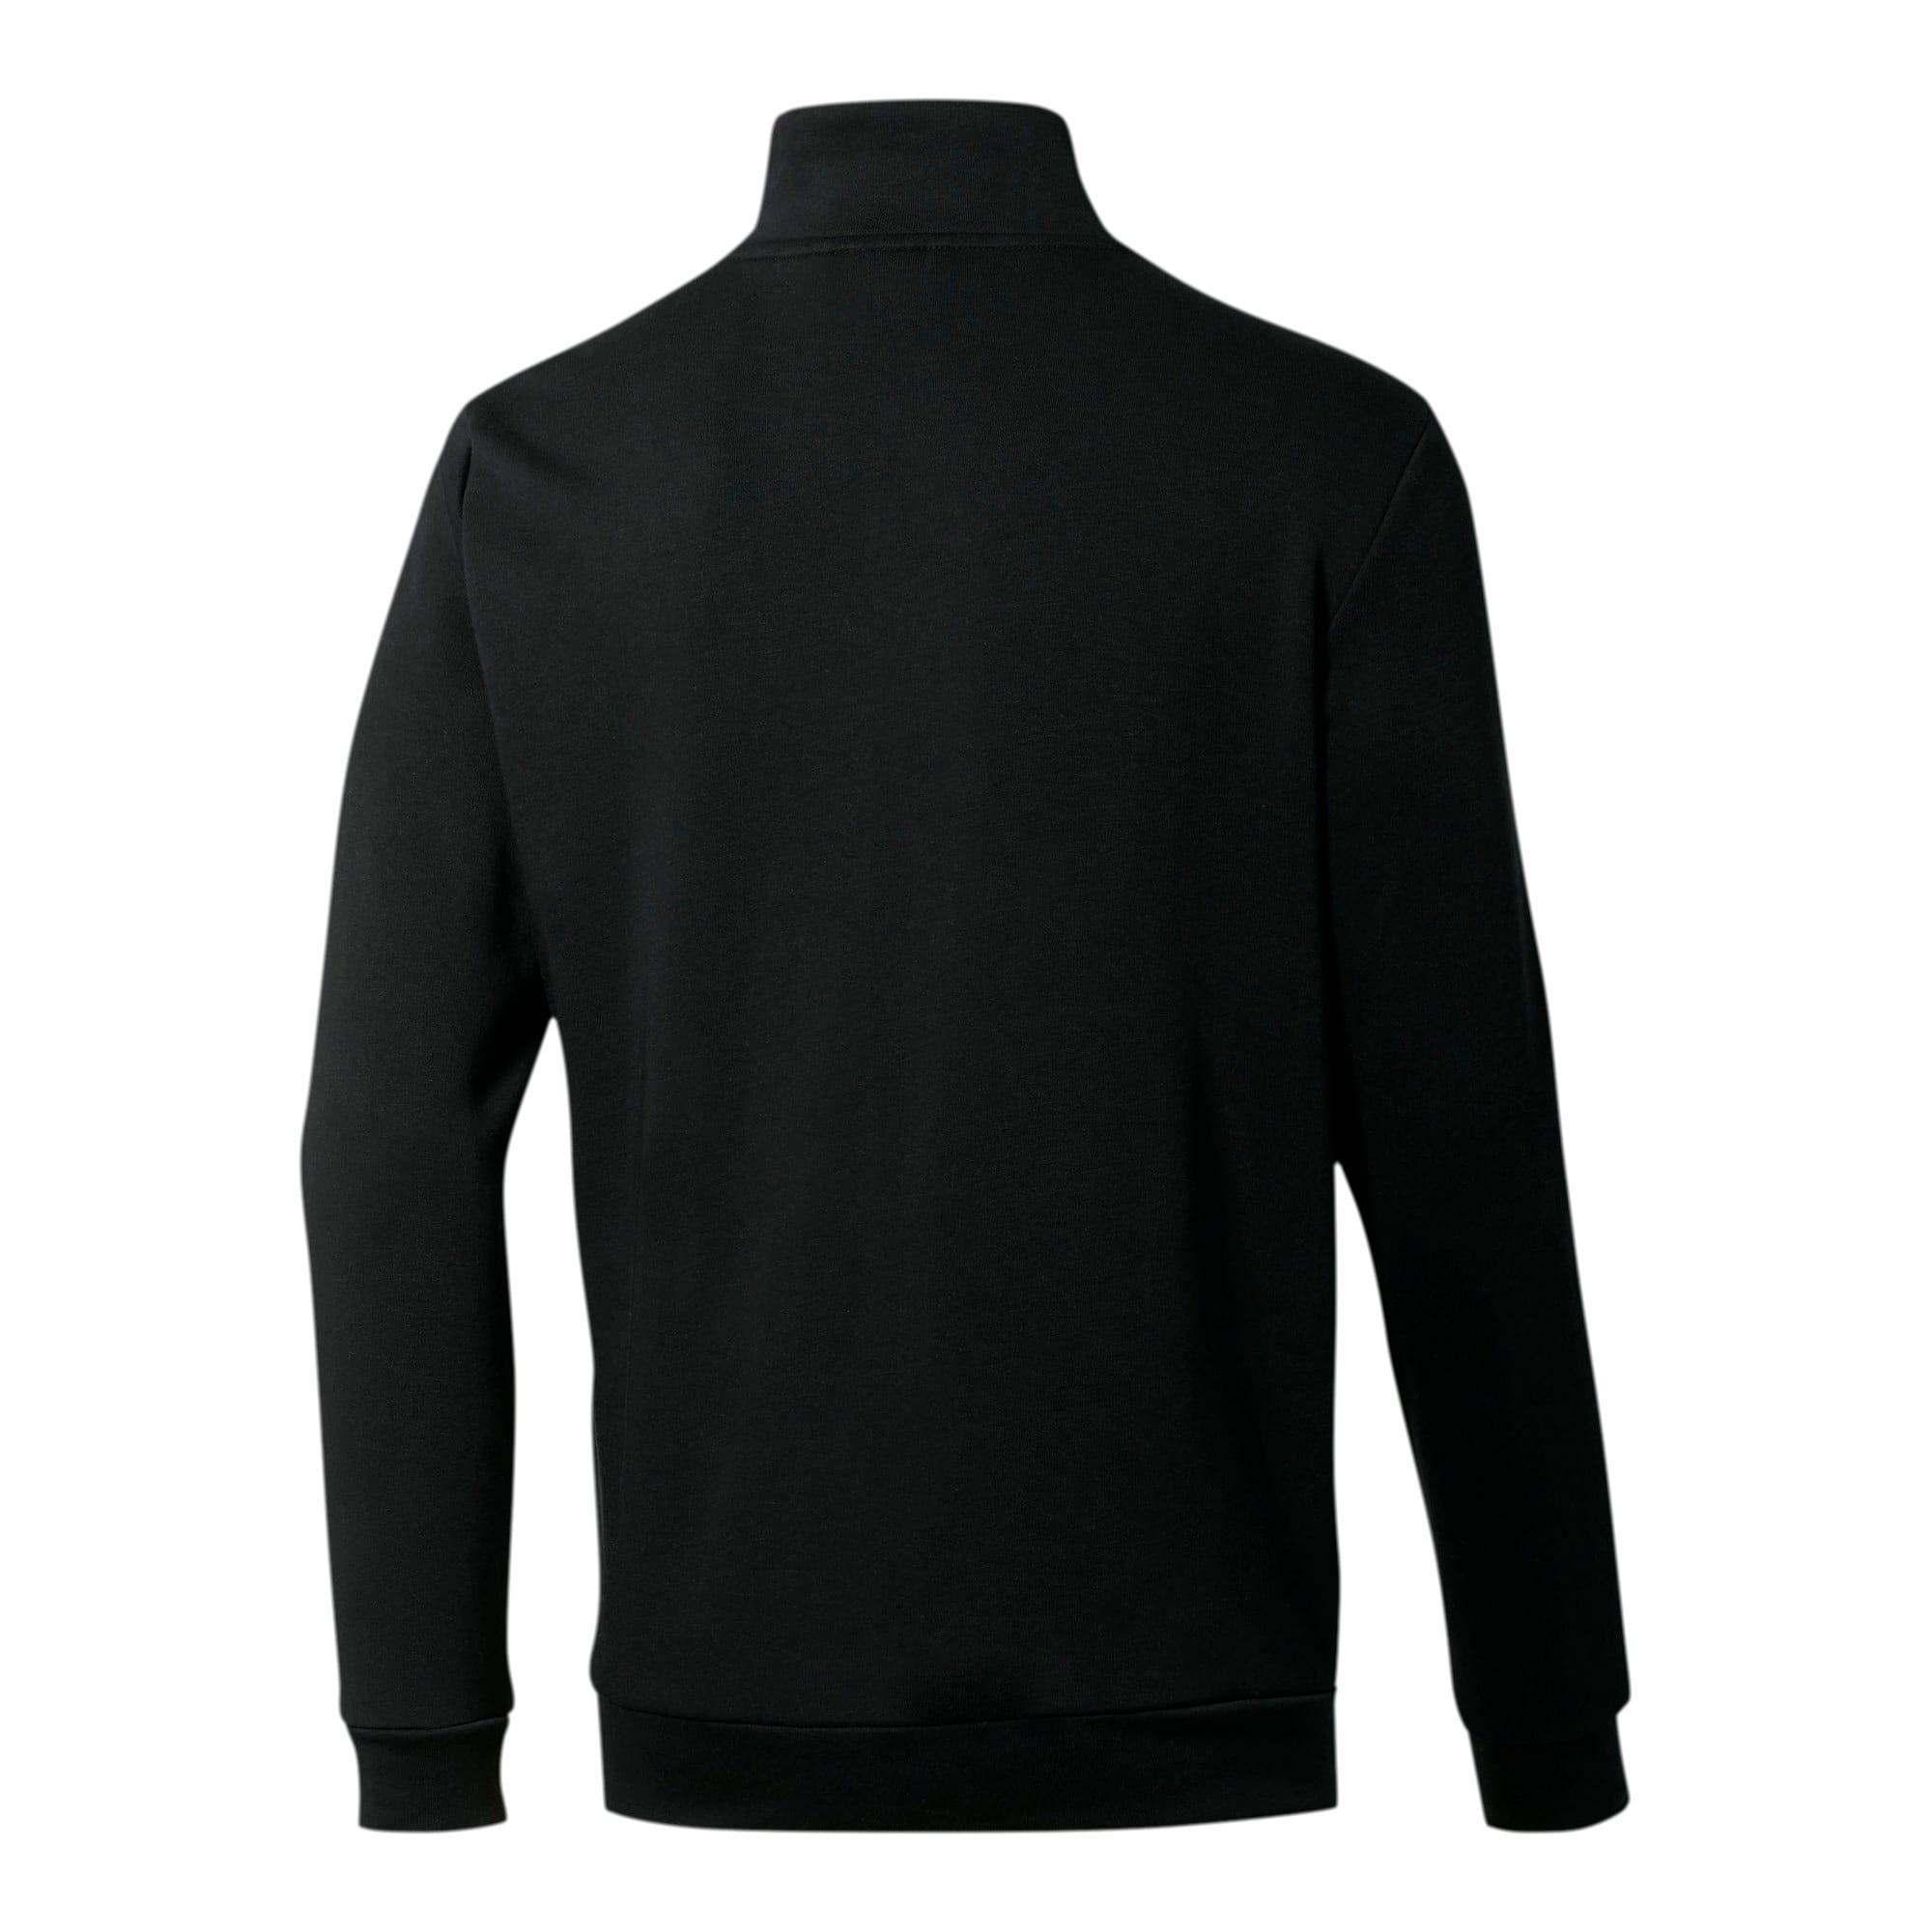 Thumbnail 2 of PUMA x CLOUD9 High Score Men's Track Jacket, Cotton Black, medium